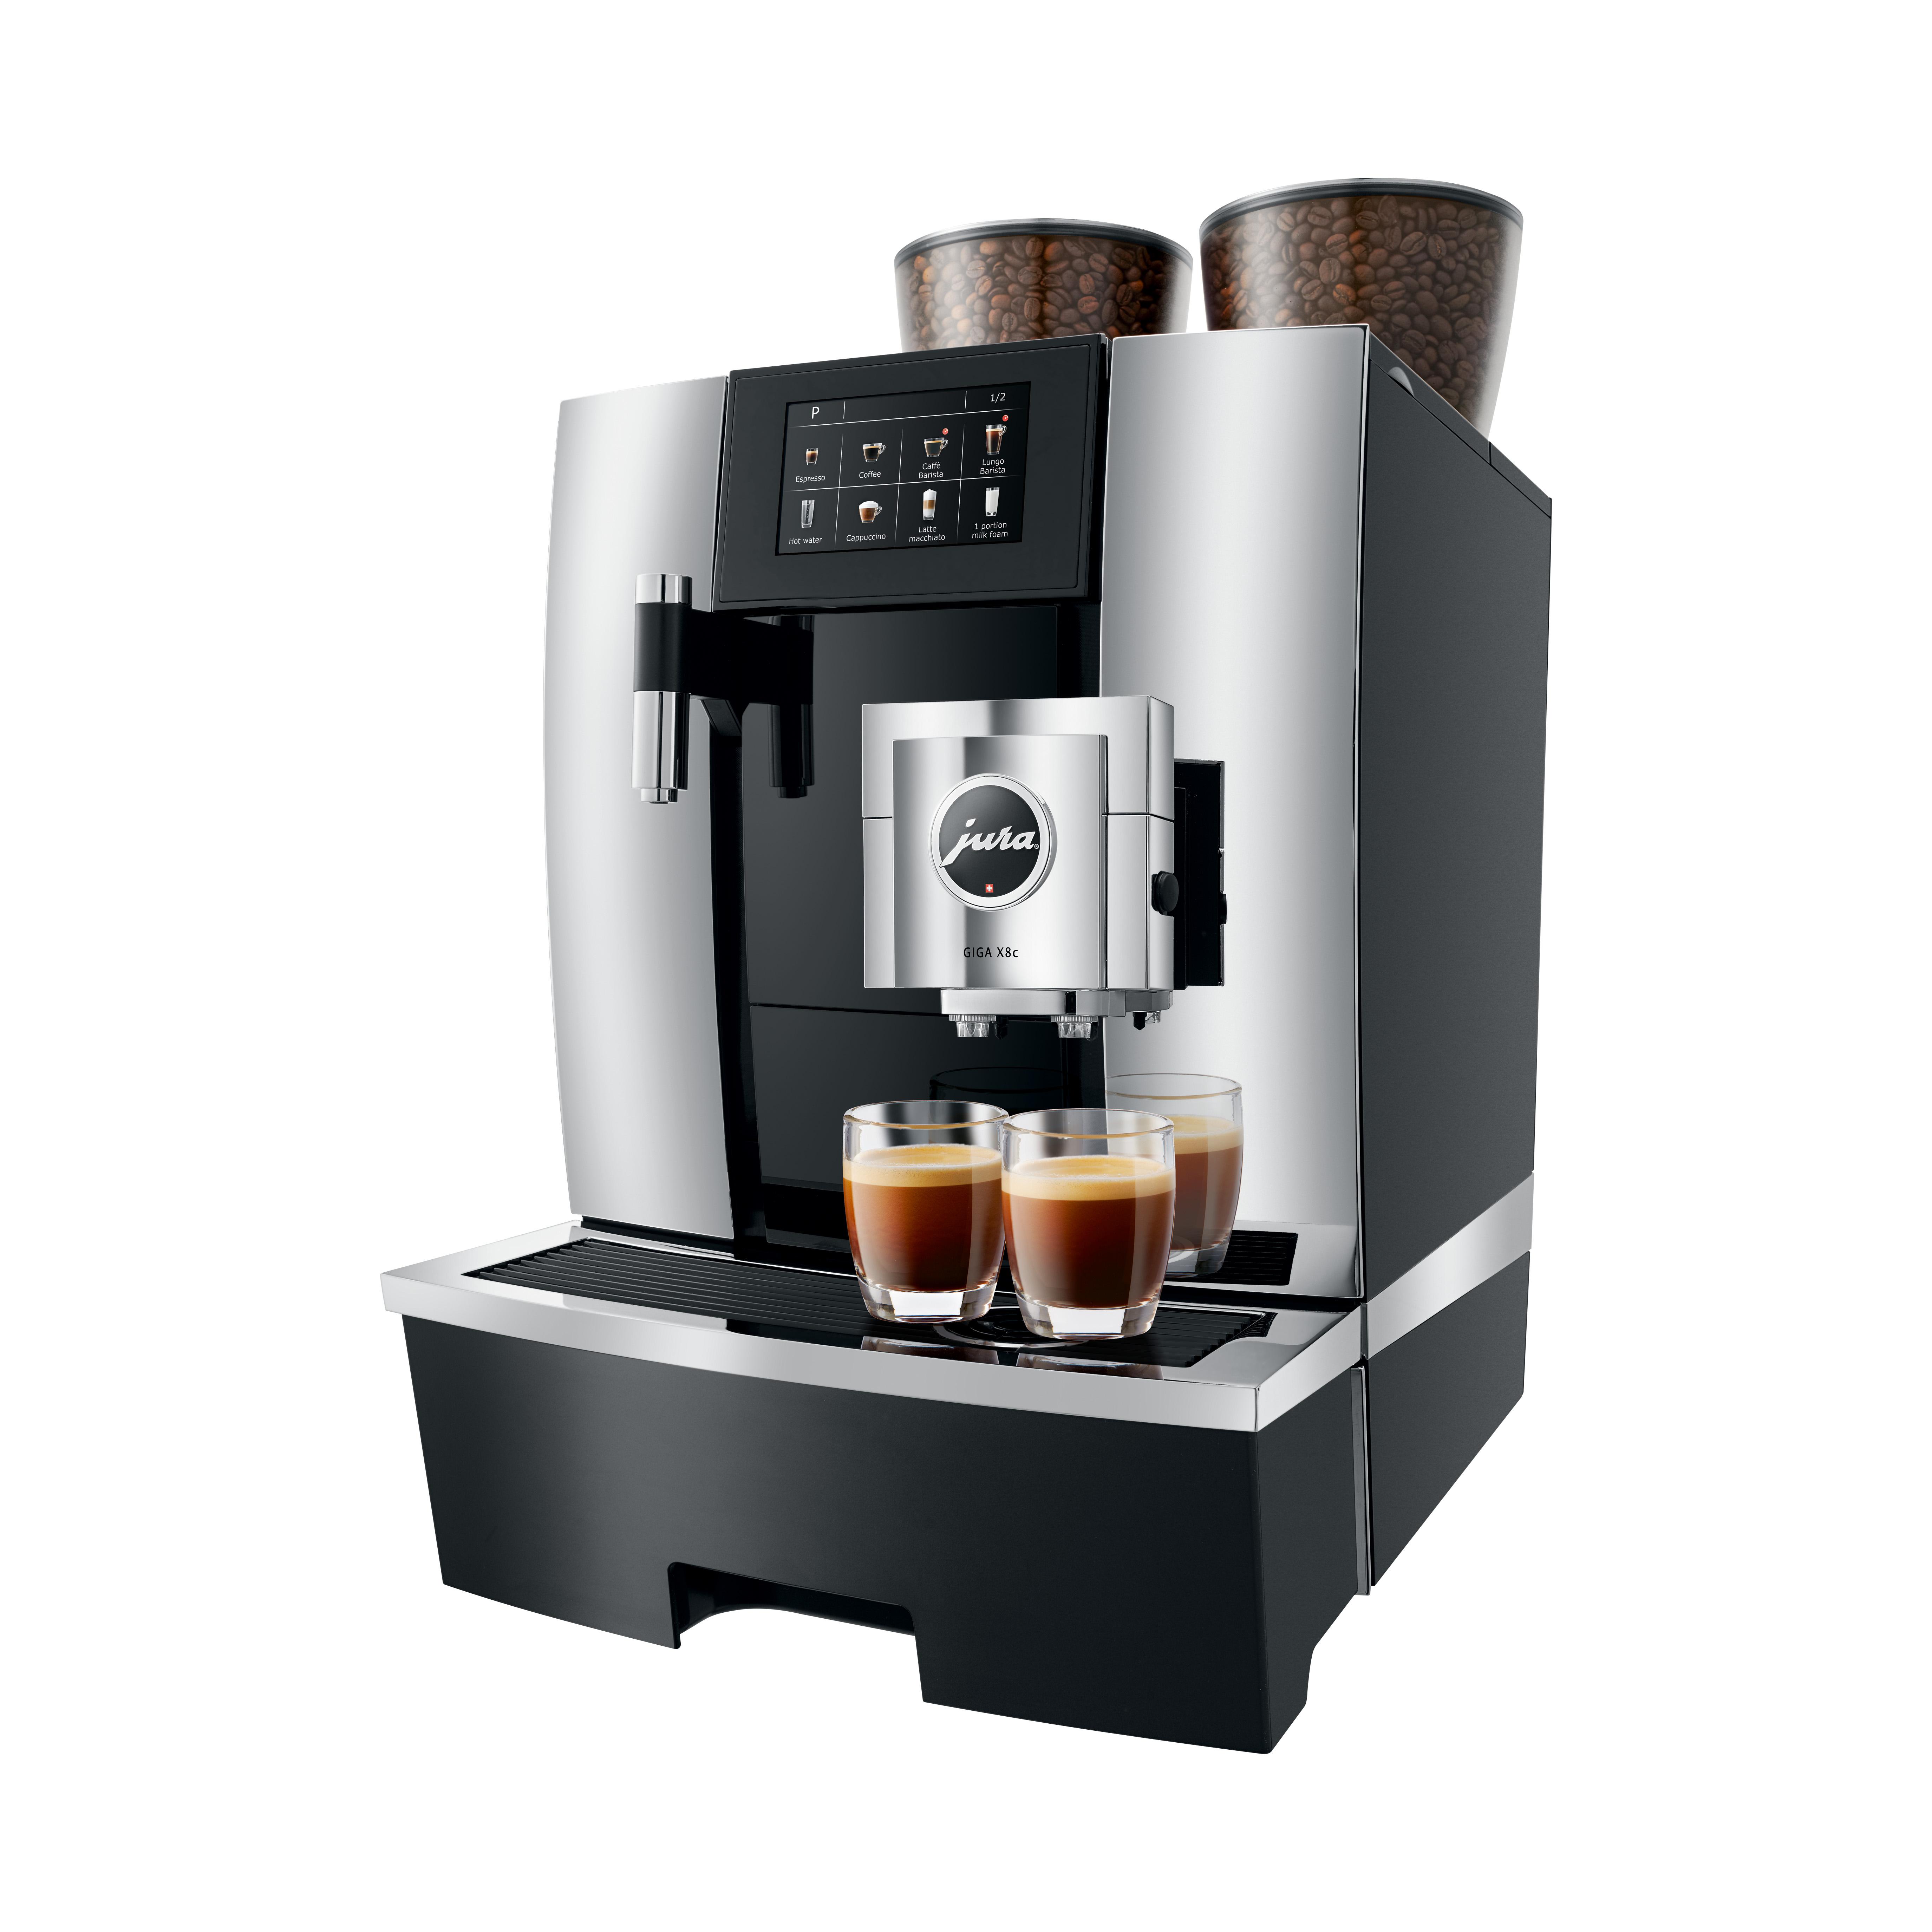 Jura Professional koffiemachines